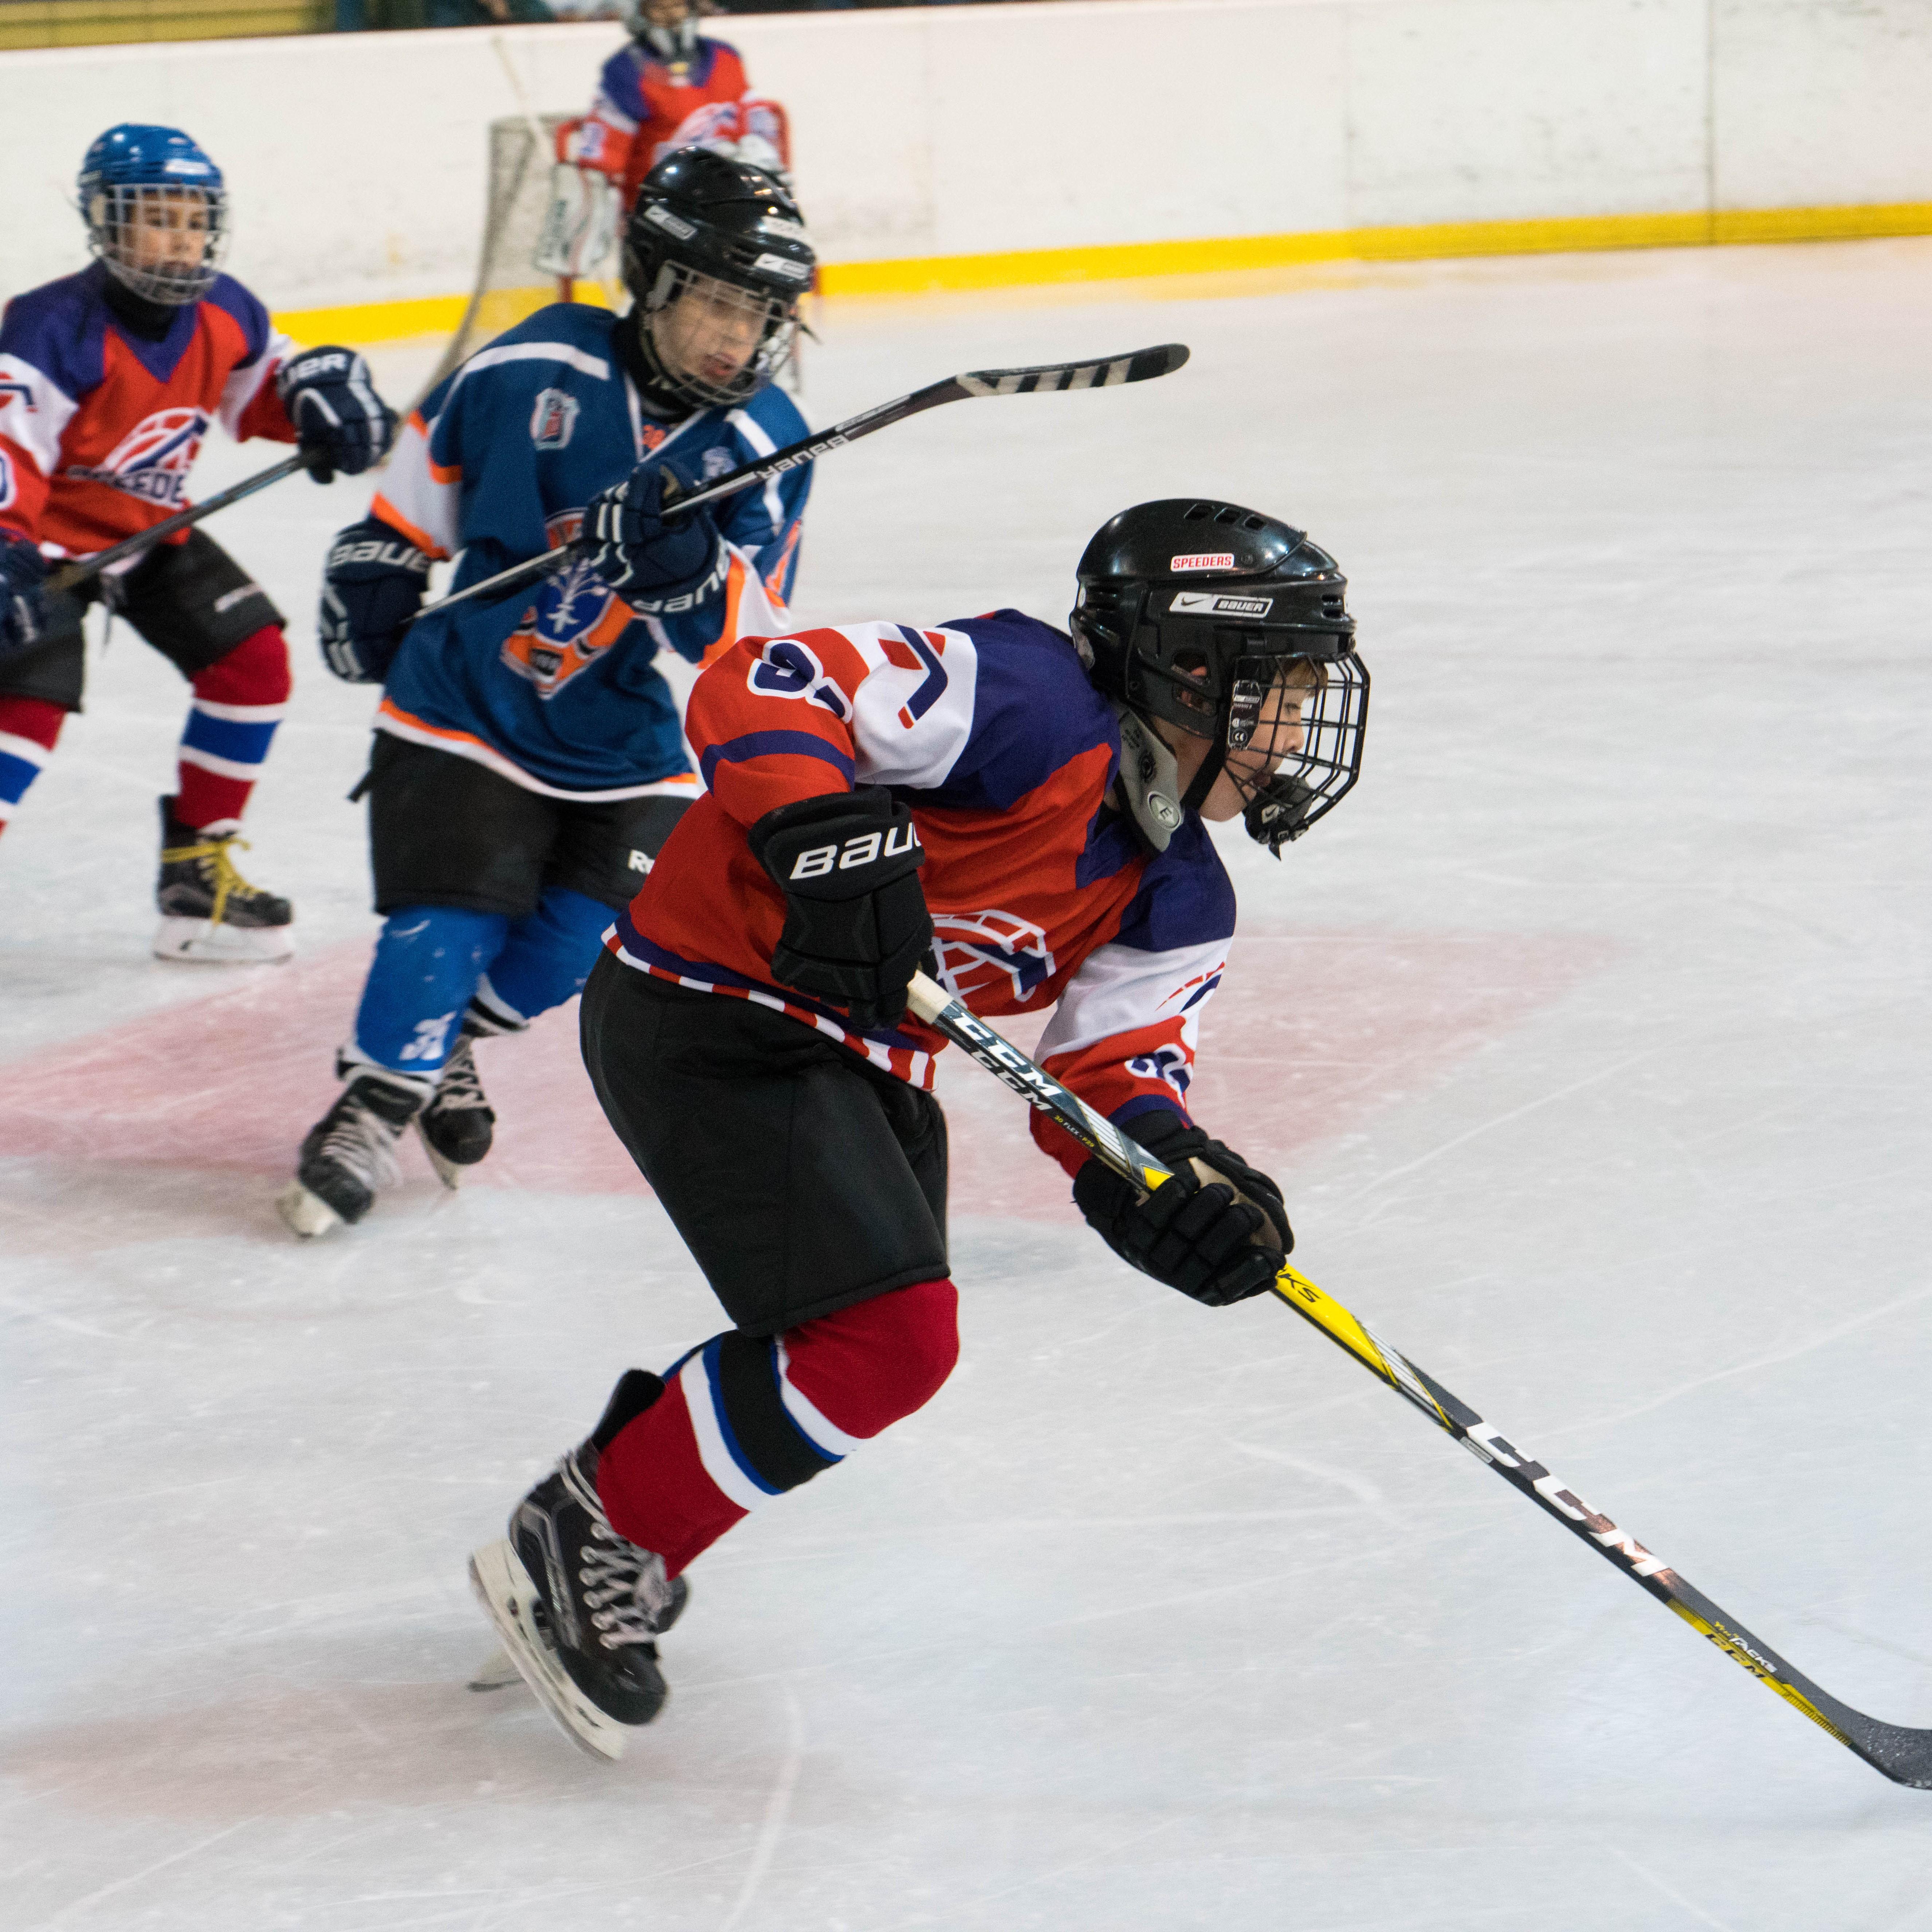 hokejovy turnaj Puchov 2.miesto speeders bratislava seliga